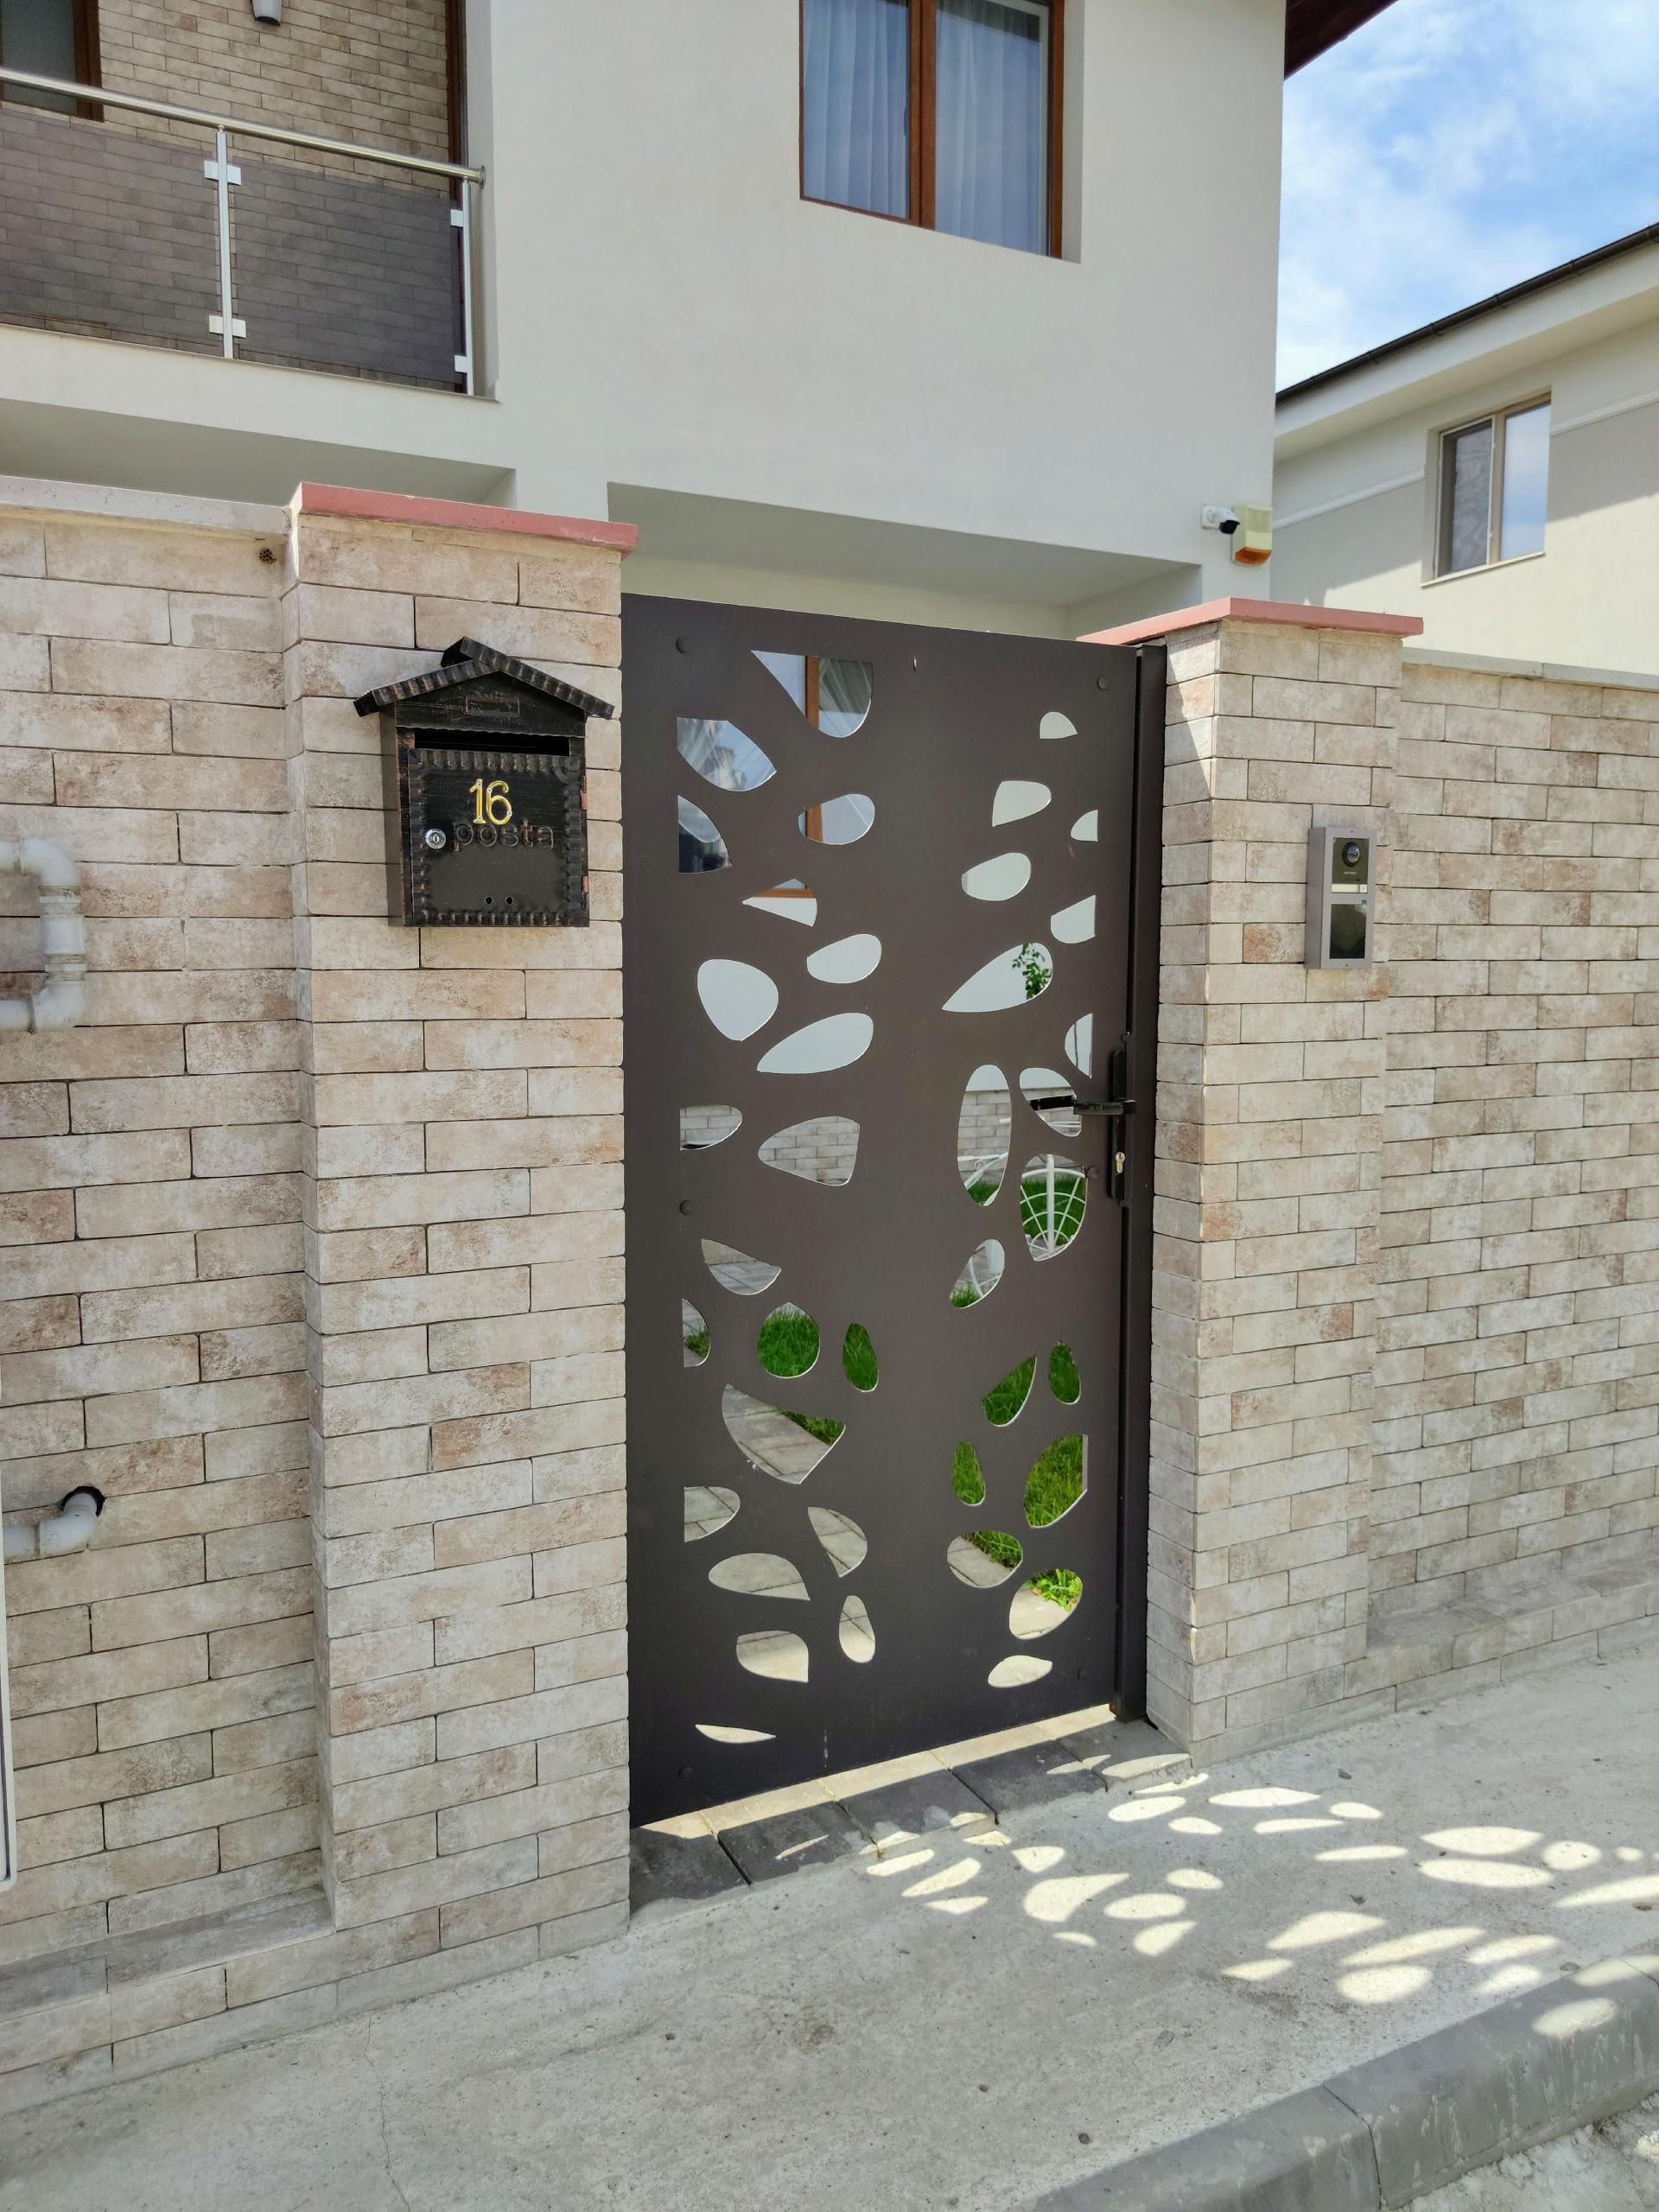 Gard placat cu piatra decerativa si poarta pietonala traforata